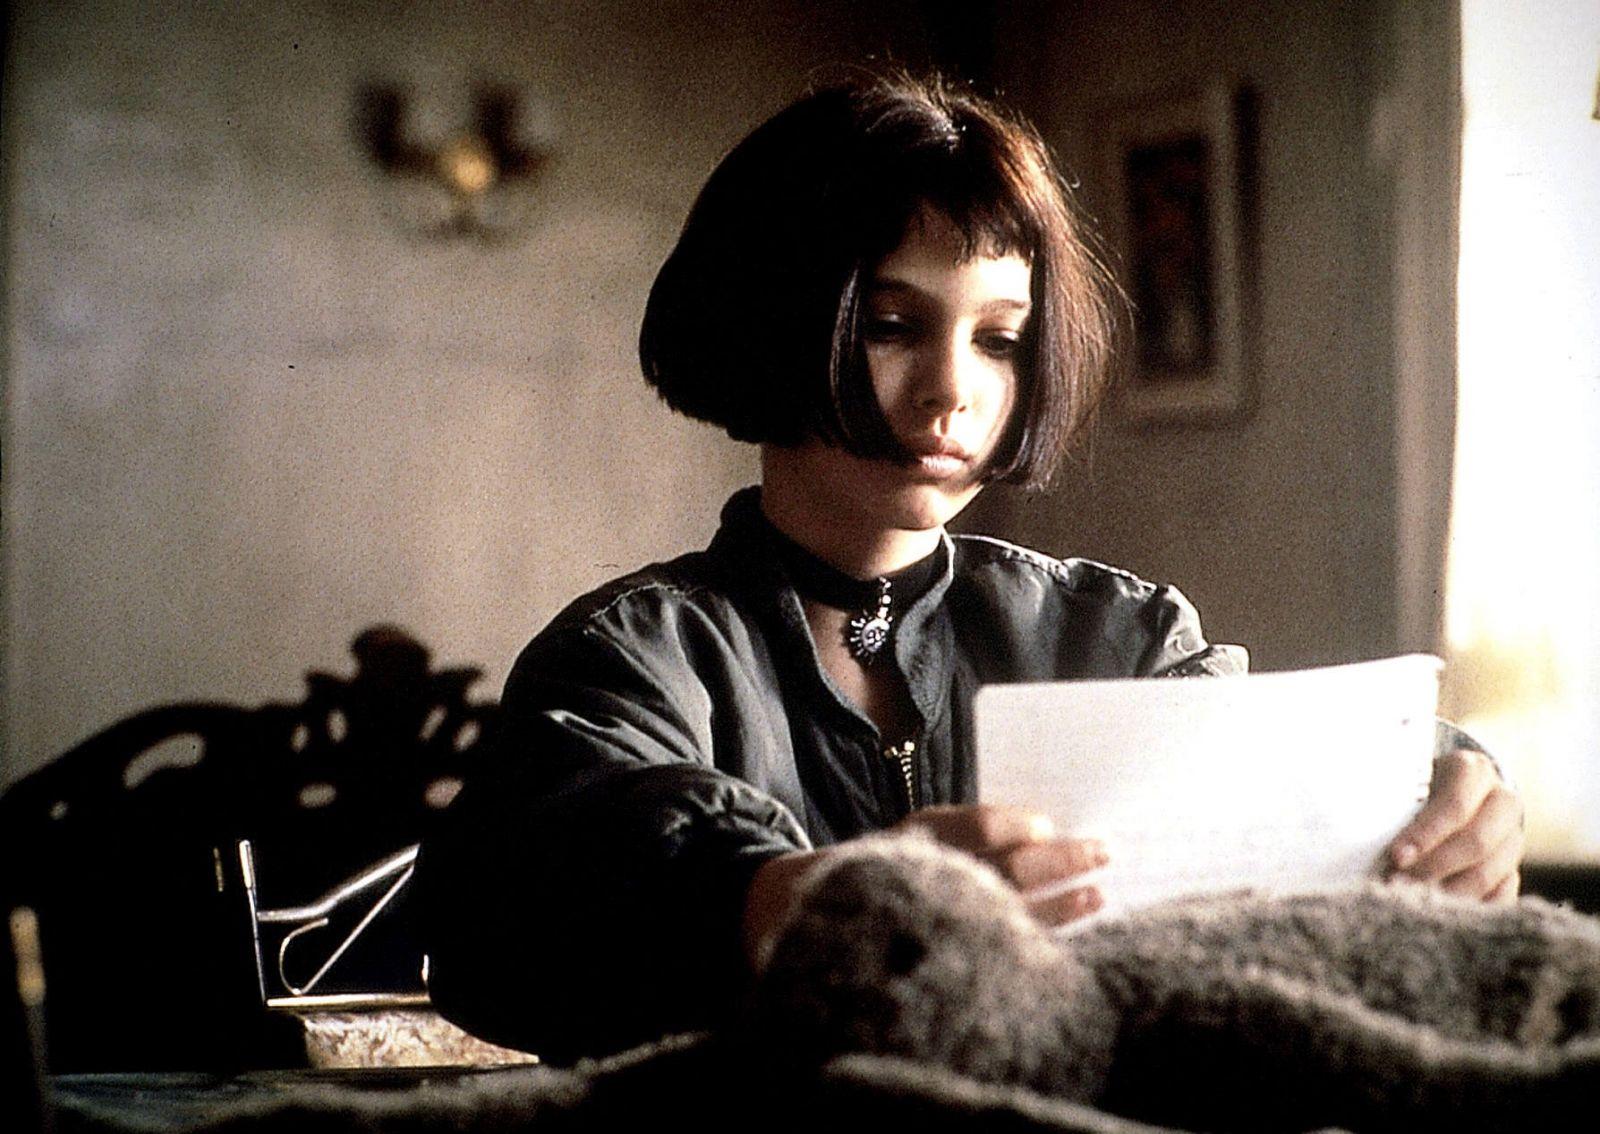 фото из фильма леон